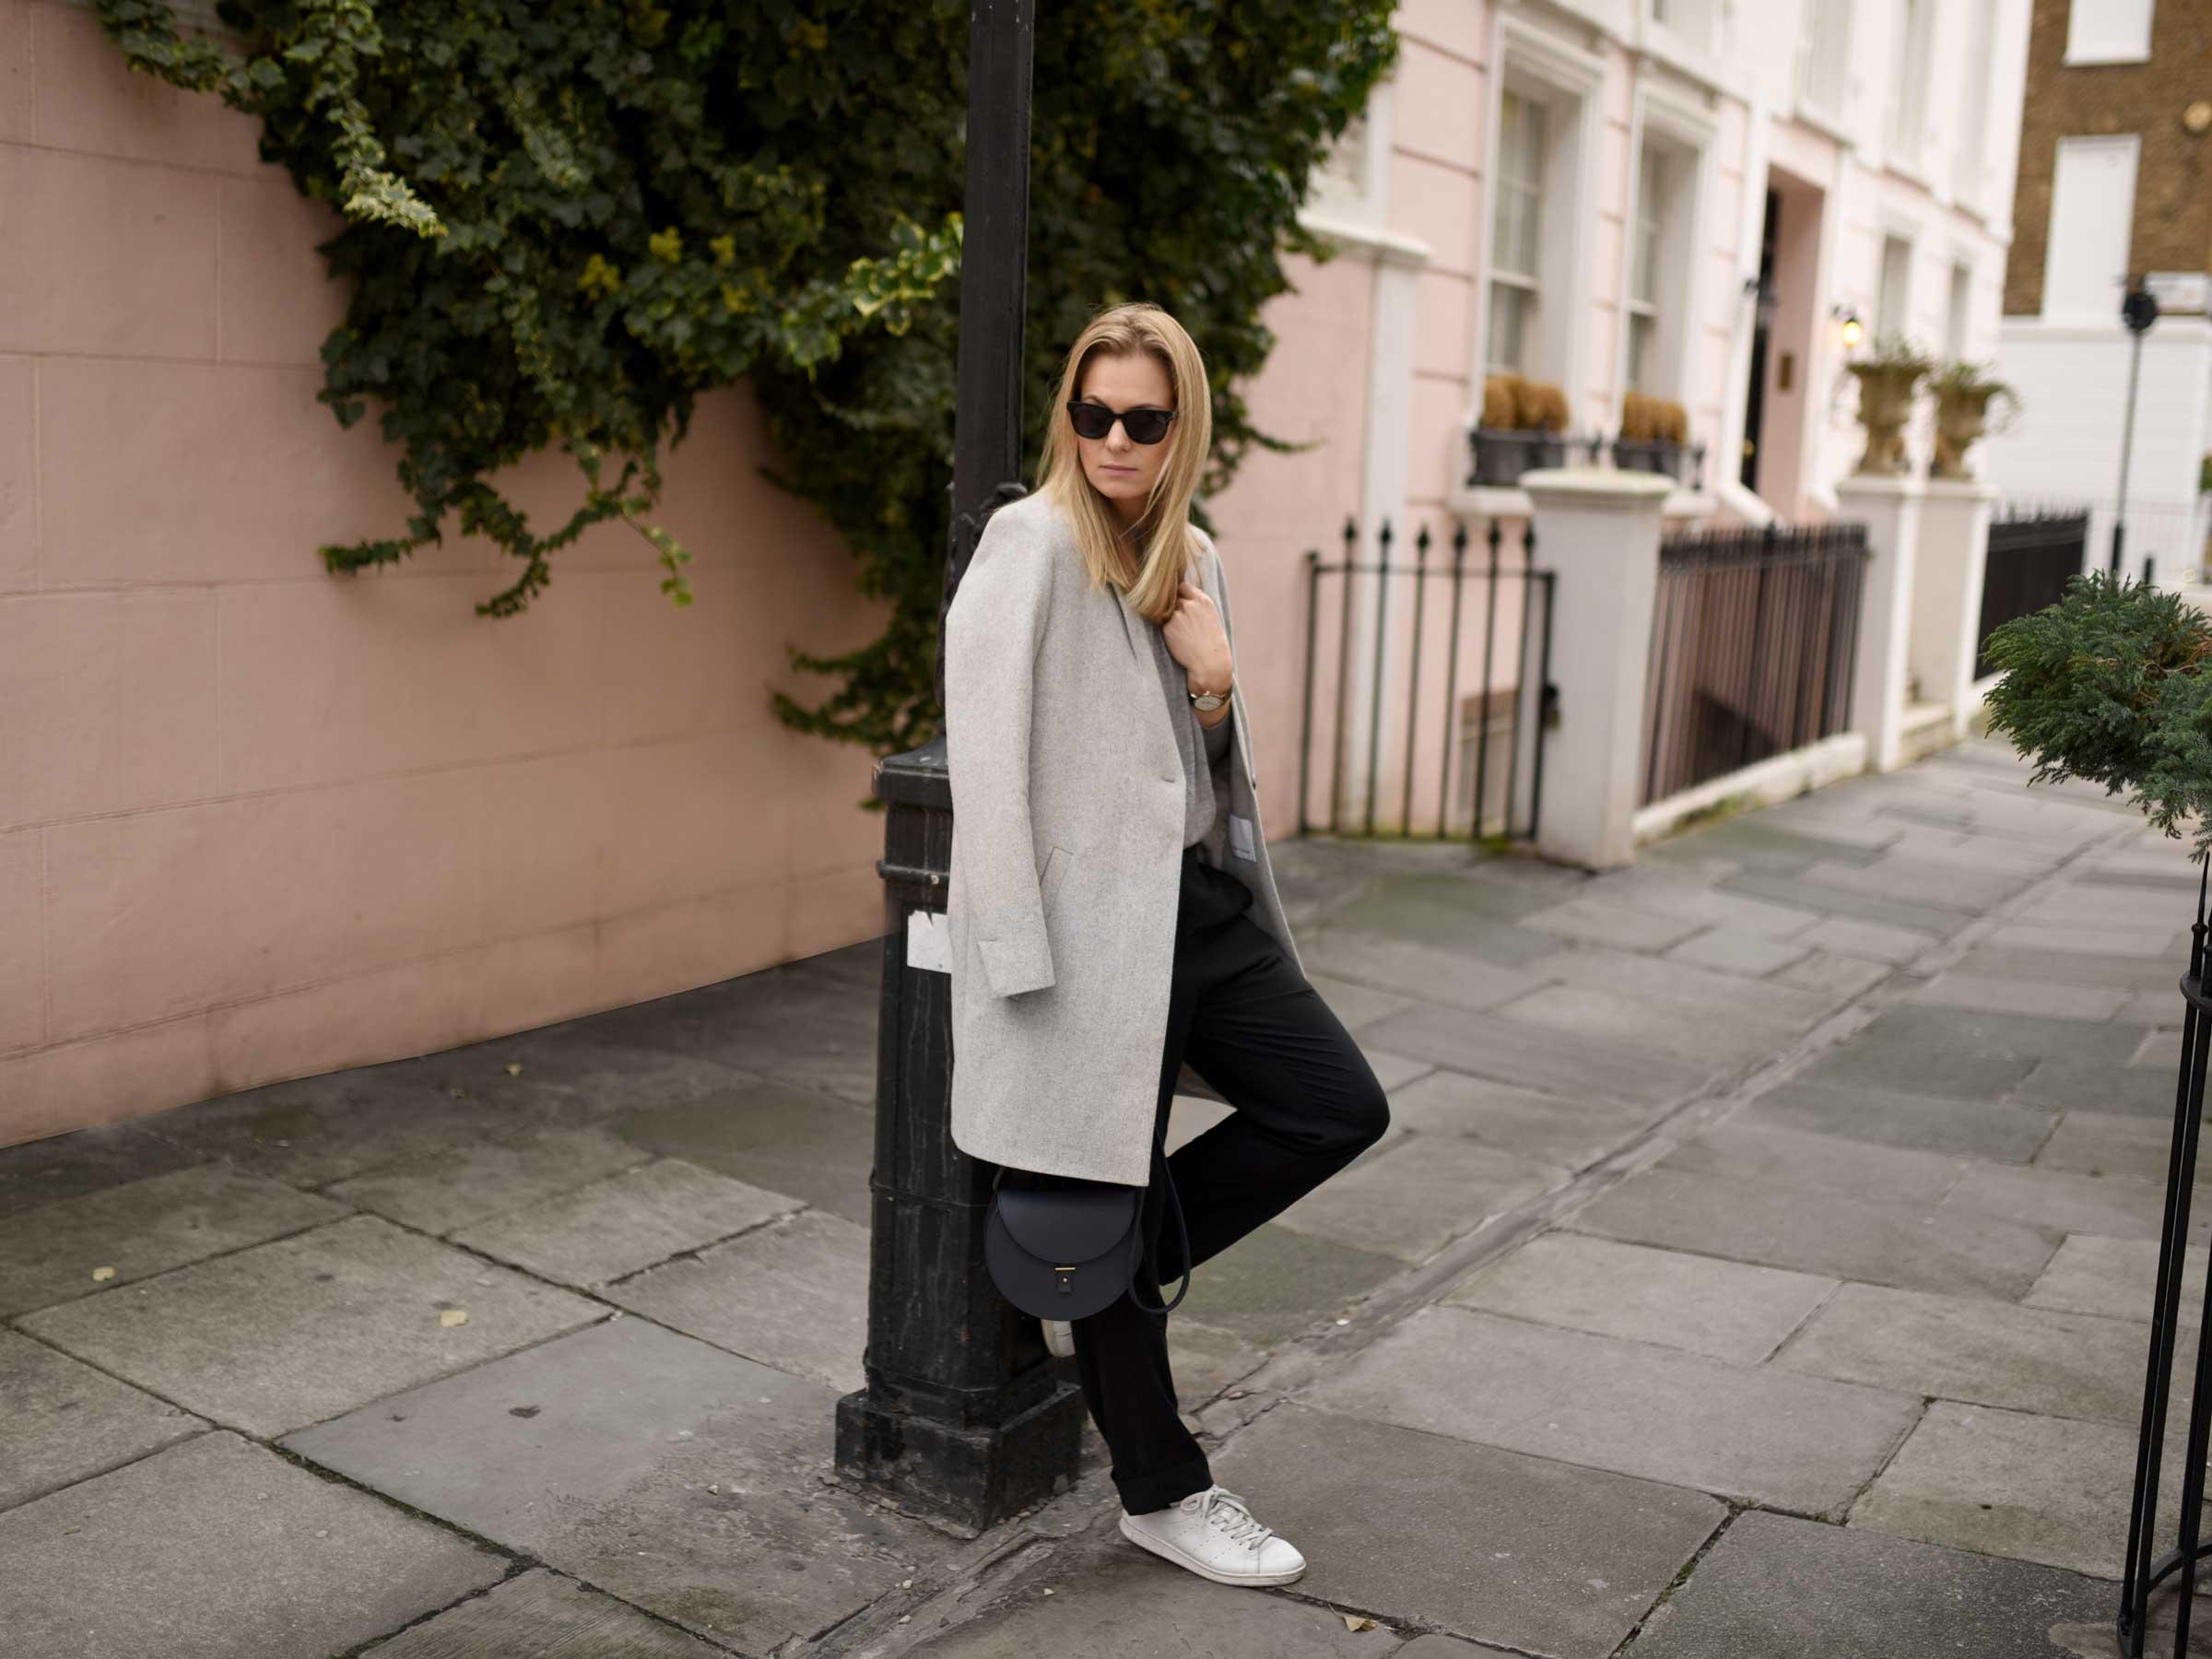 Style&Minimalism | It's Personal | Wearing Samsøe & Samsøe, PB0110, Alexander Wang, Lemaire x UNIQLO